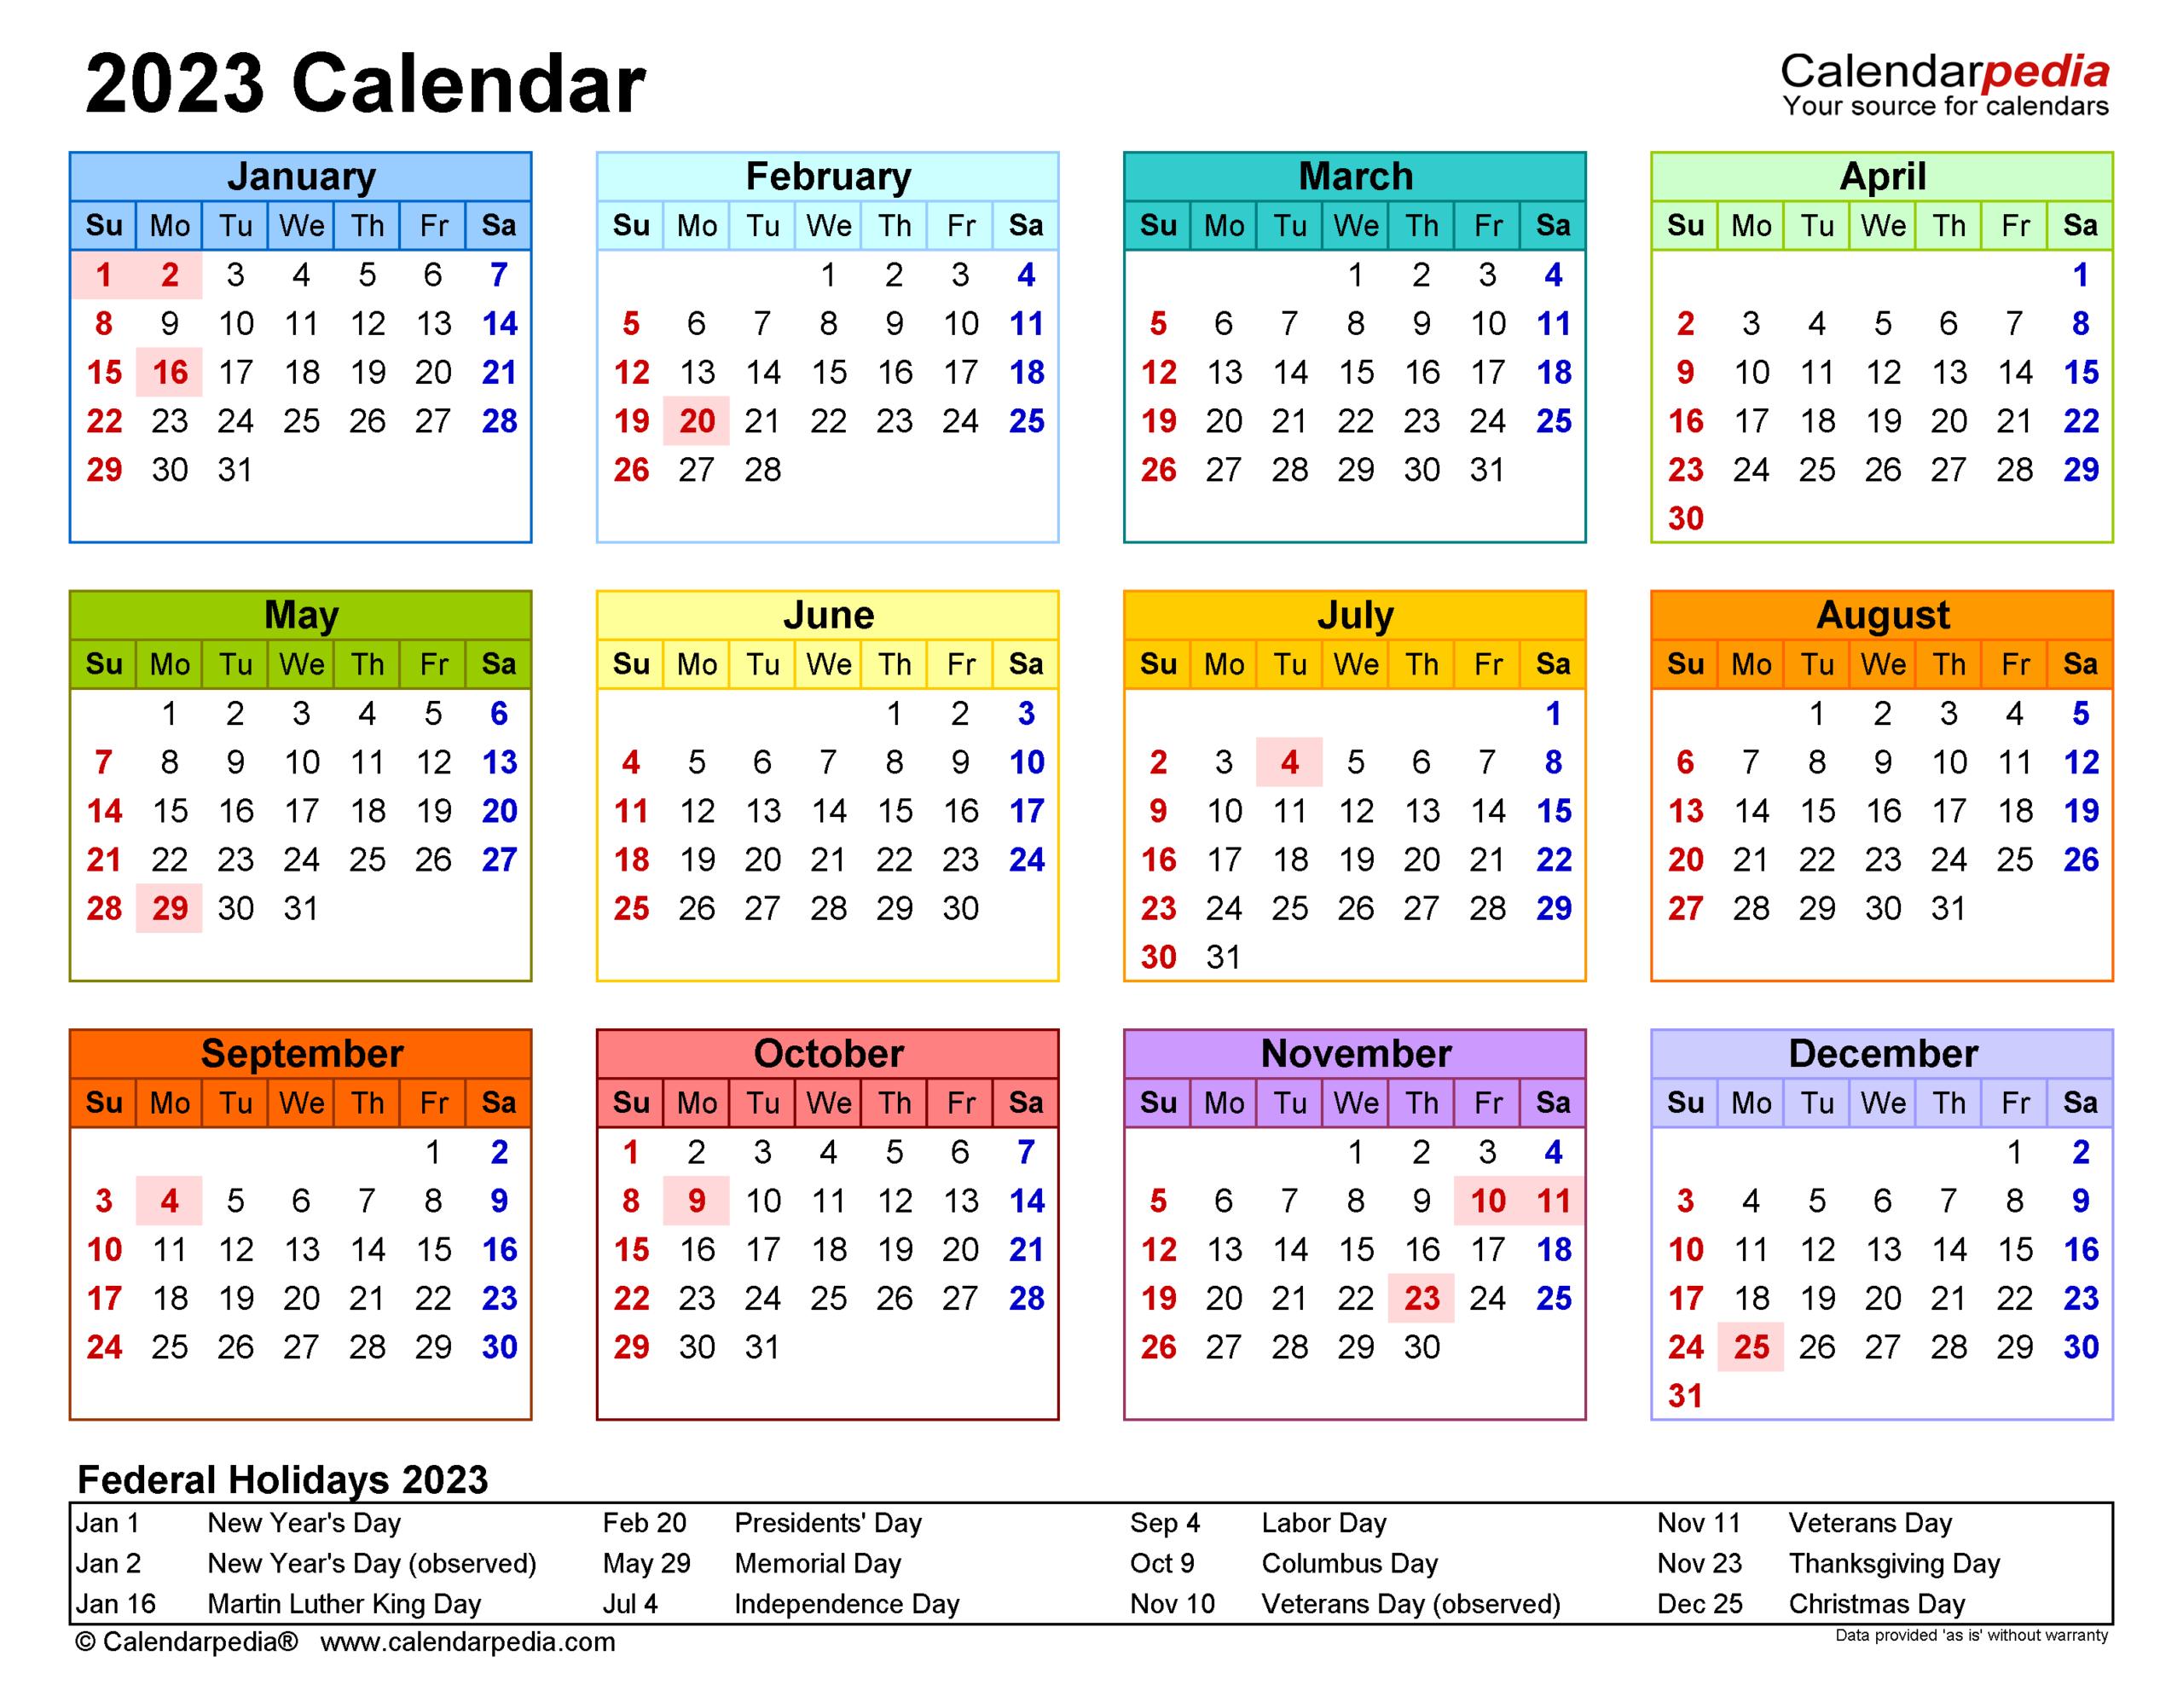 2023 Calendar - Free Printable Word Templates - Calendarpedia inside 2022 2023 School Calendar North Penn